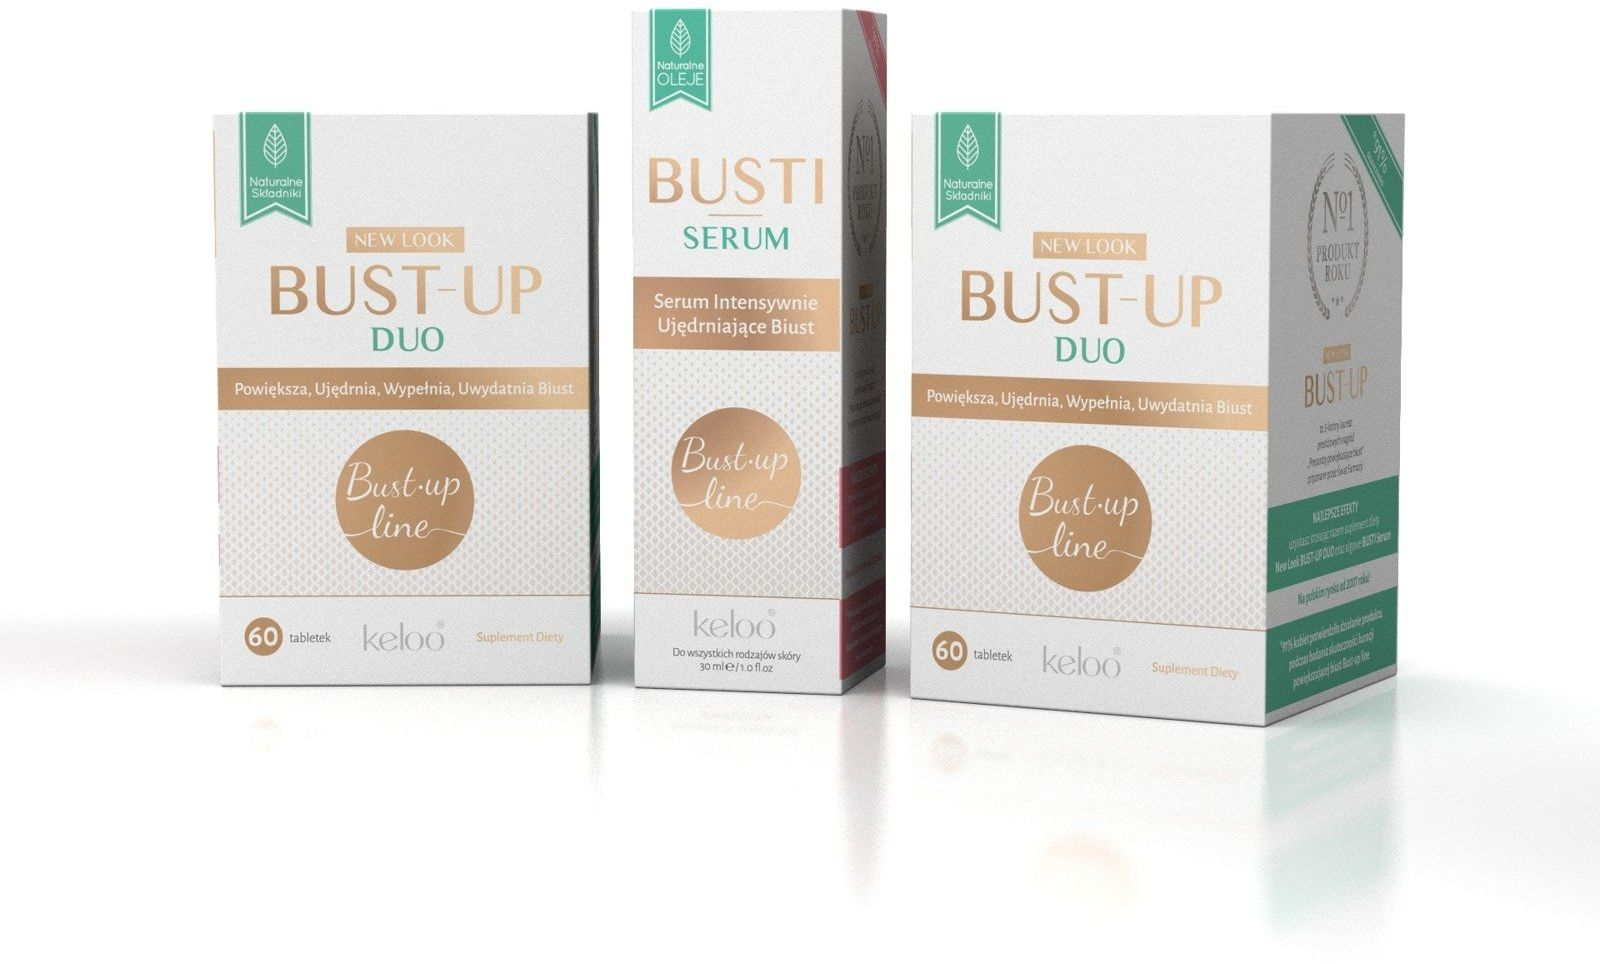 STARTER Miesięczna kuracja BUST-UP Line ( 2 x 60 kapsułek ) + BUSTI serum 30 ml